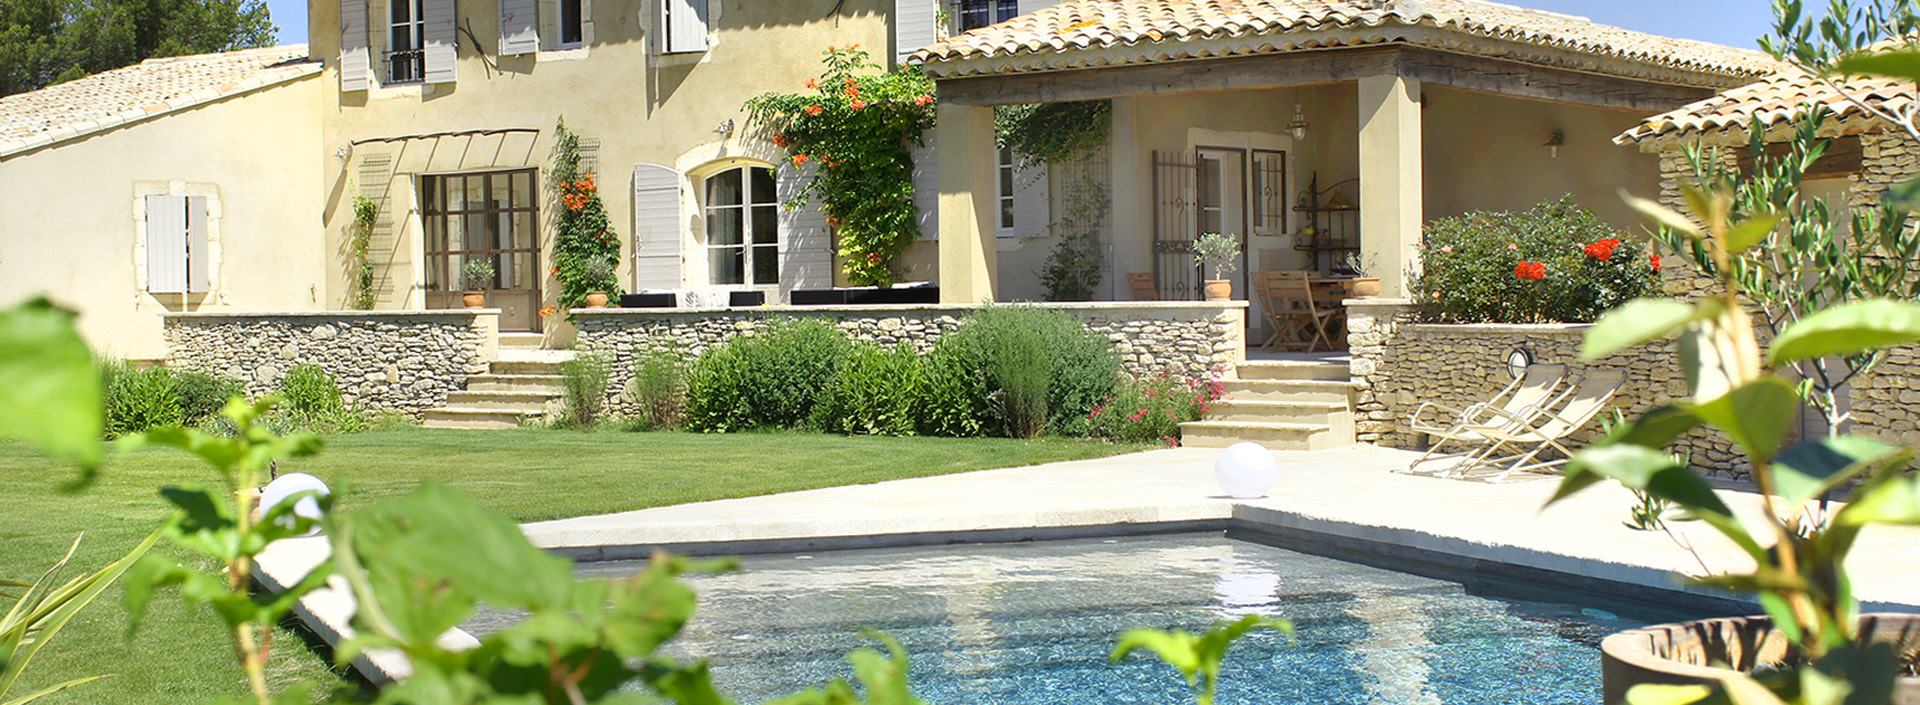 Vente villa piscine Saint-Cannat